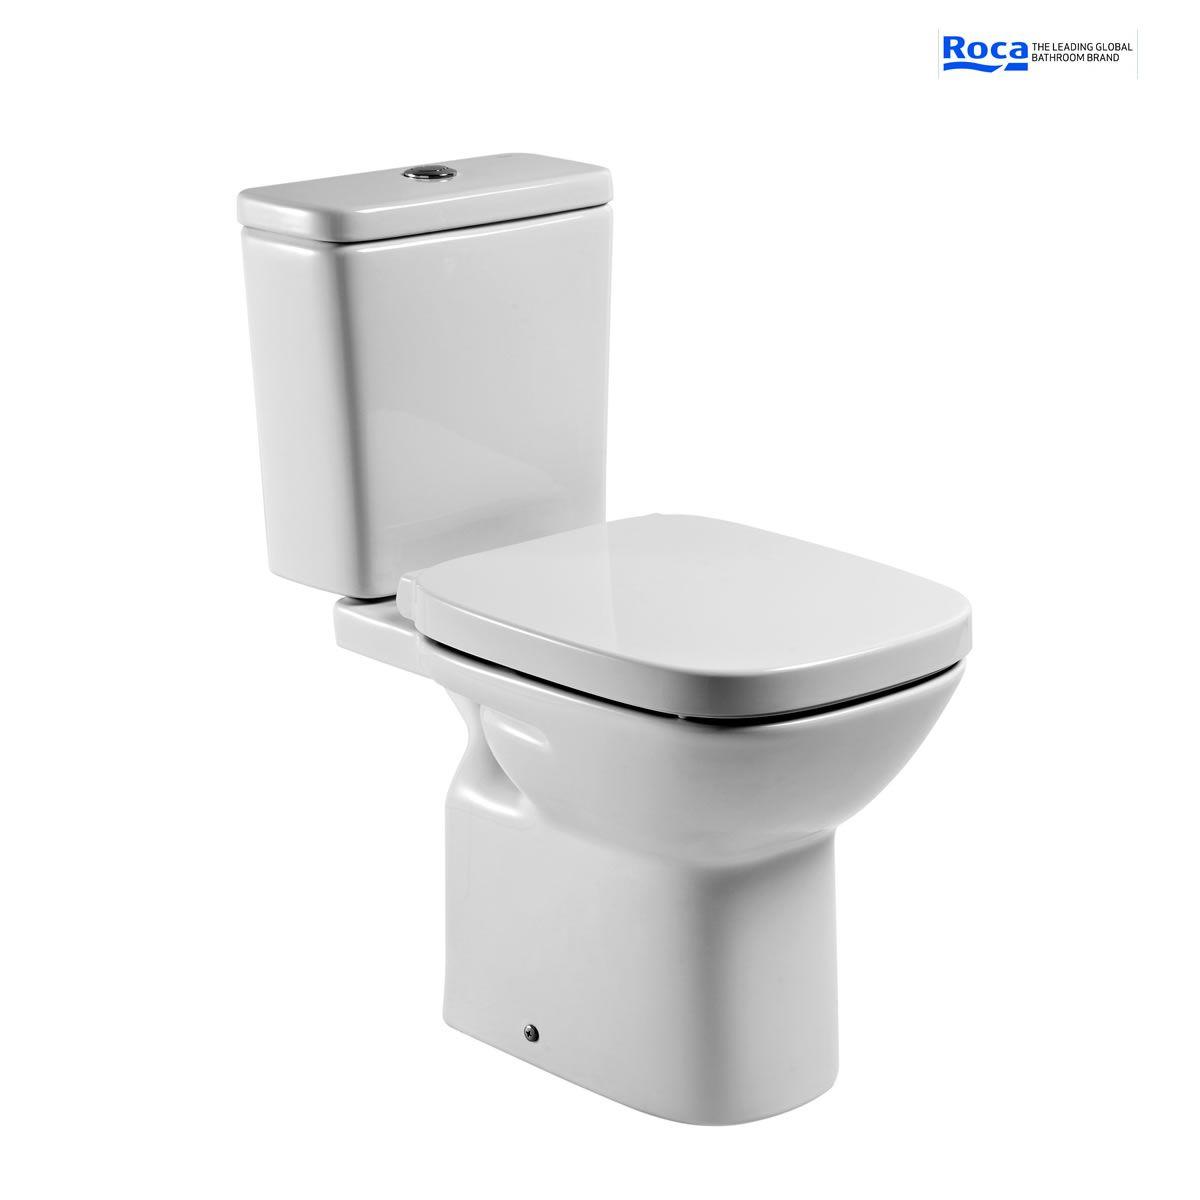 roca debba open back eco close coupled toilet uk bathrooms. Black Bedroom Furniture Sets. Home Design Ideas